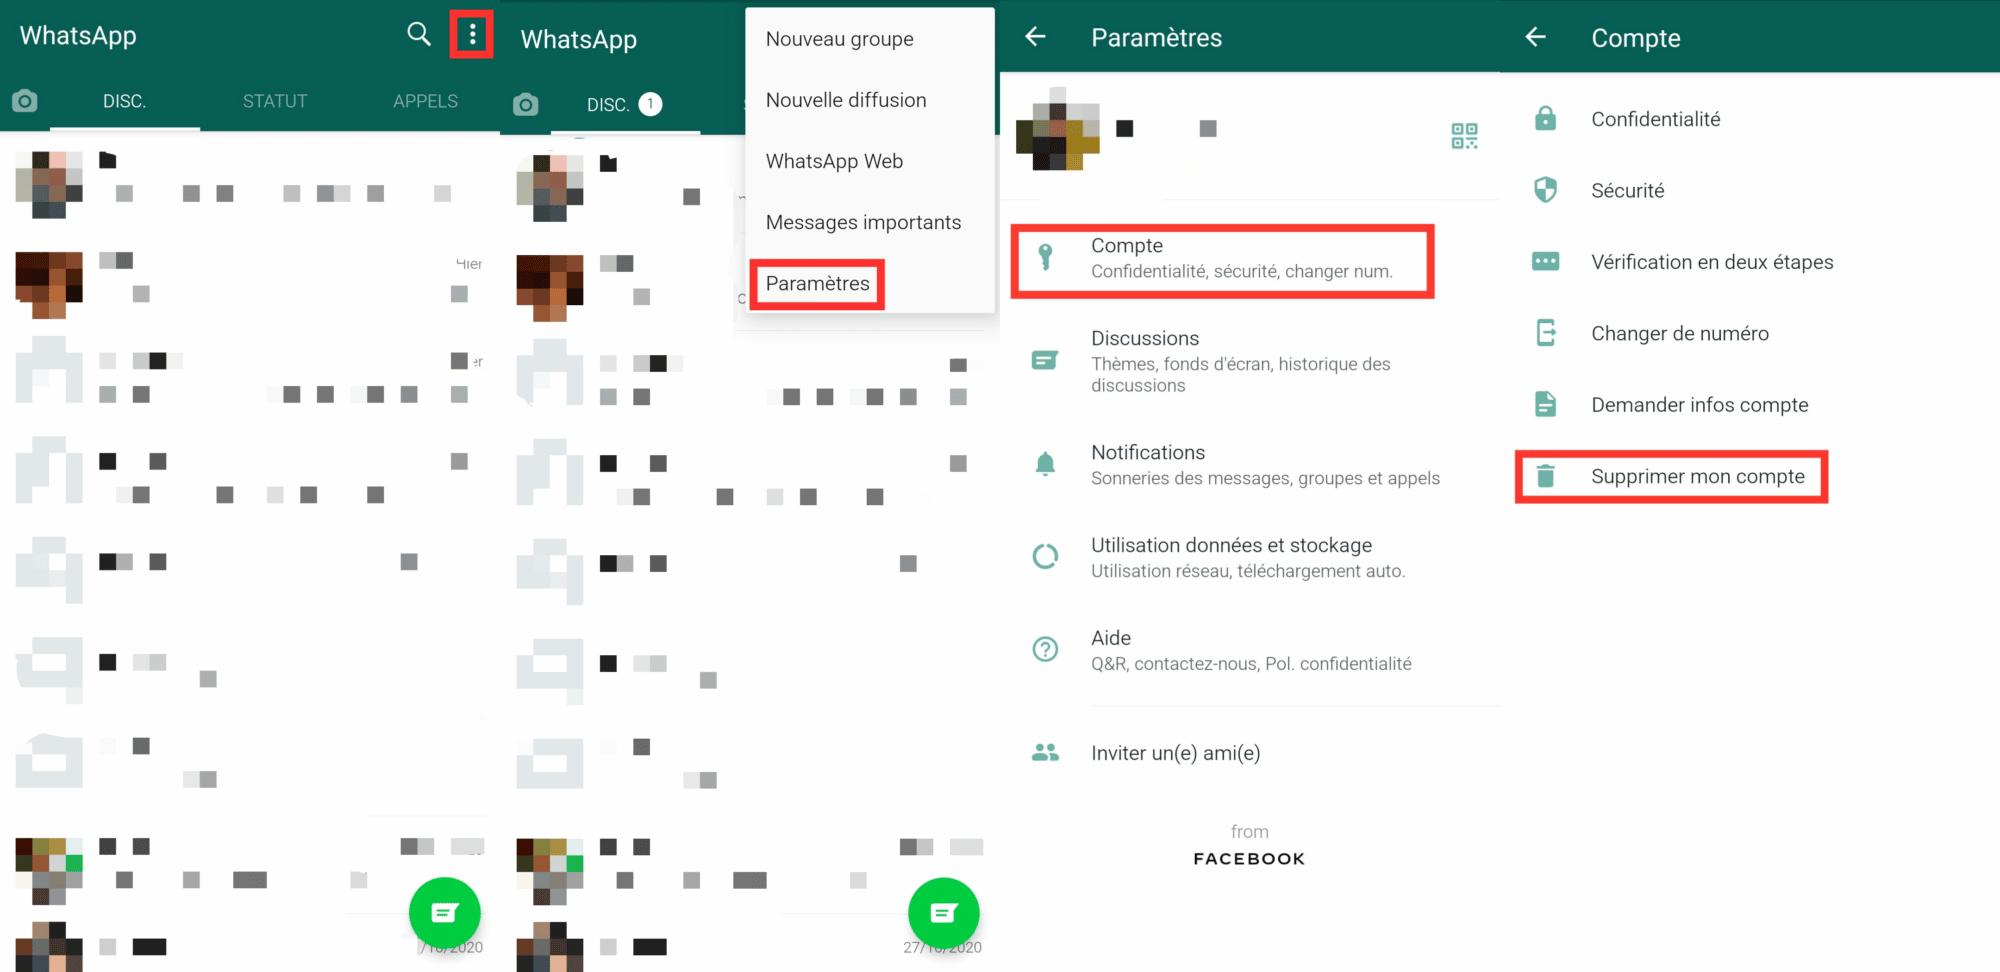 whatsapp-compte-parametres-supprimer